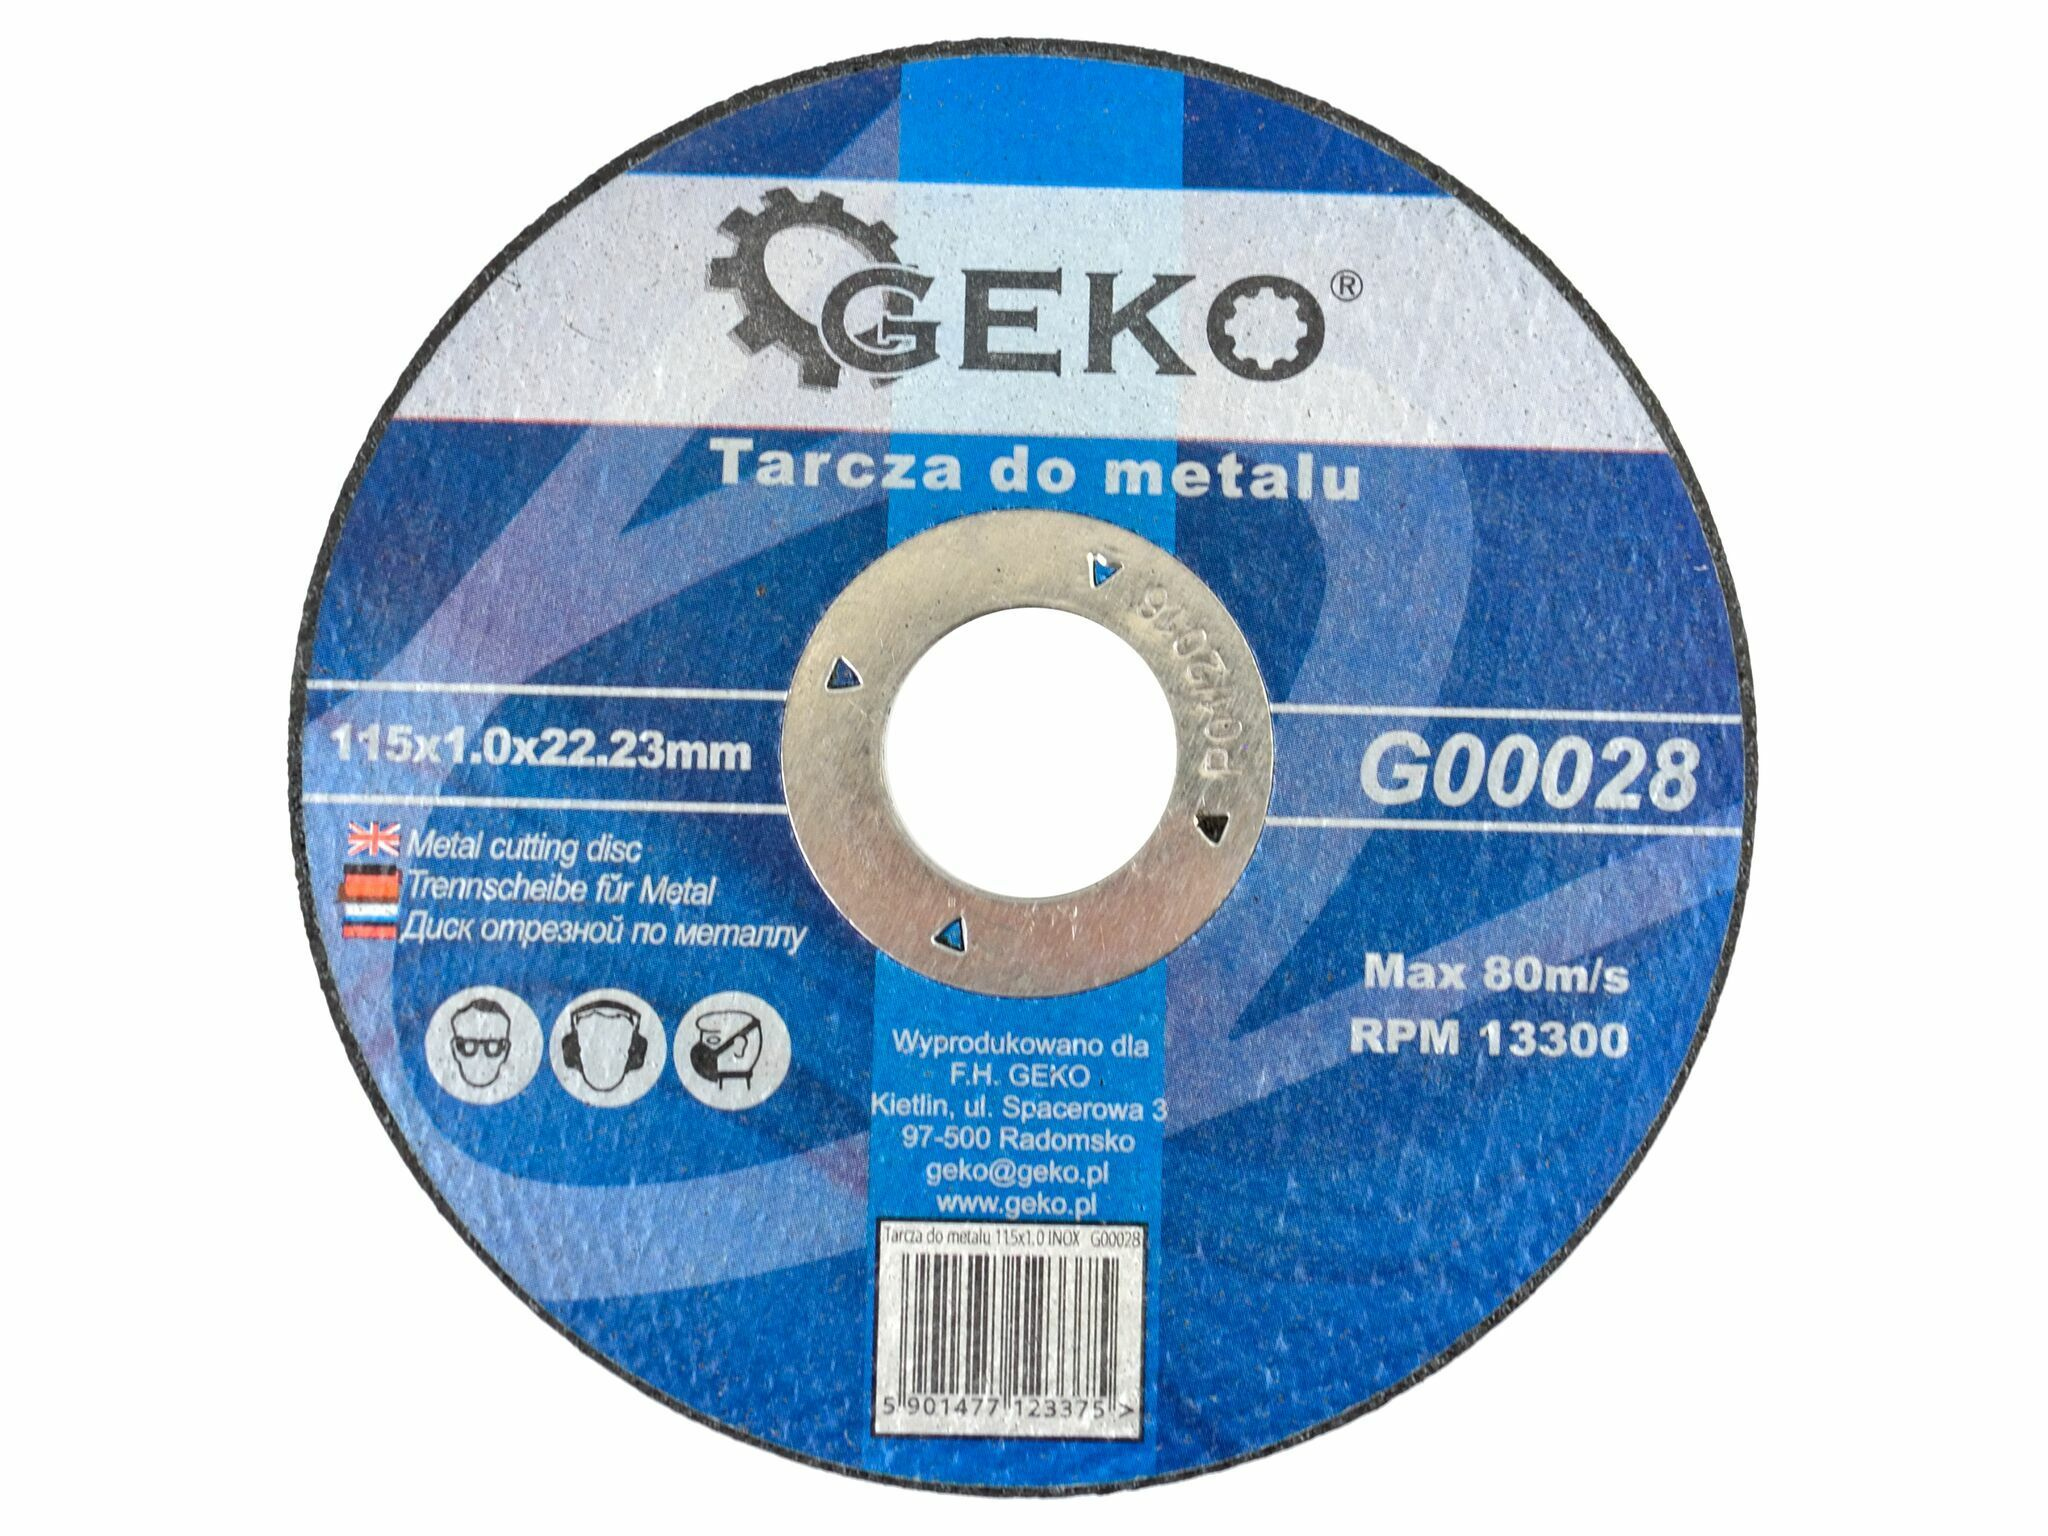 GEKO G00028 Řezný kotouč na ocel, 115x1,0mm